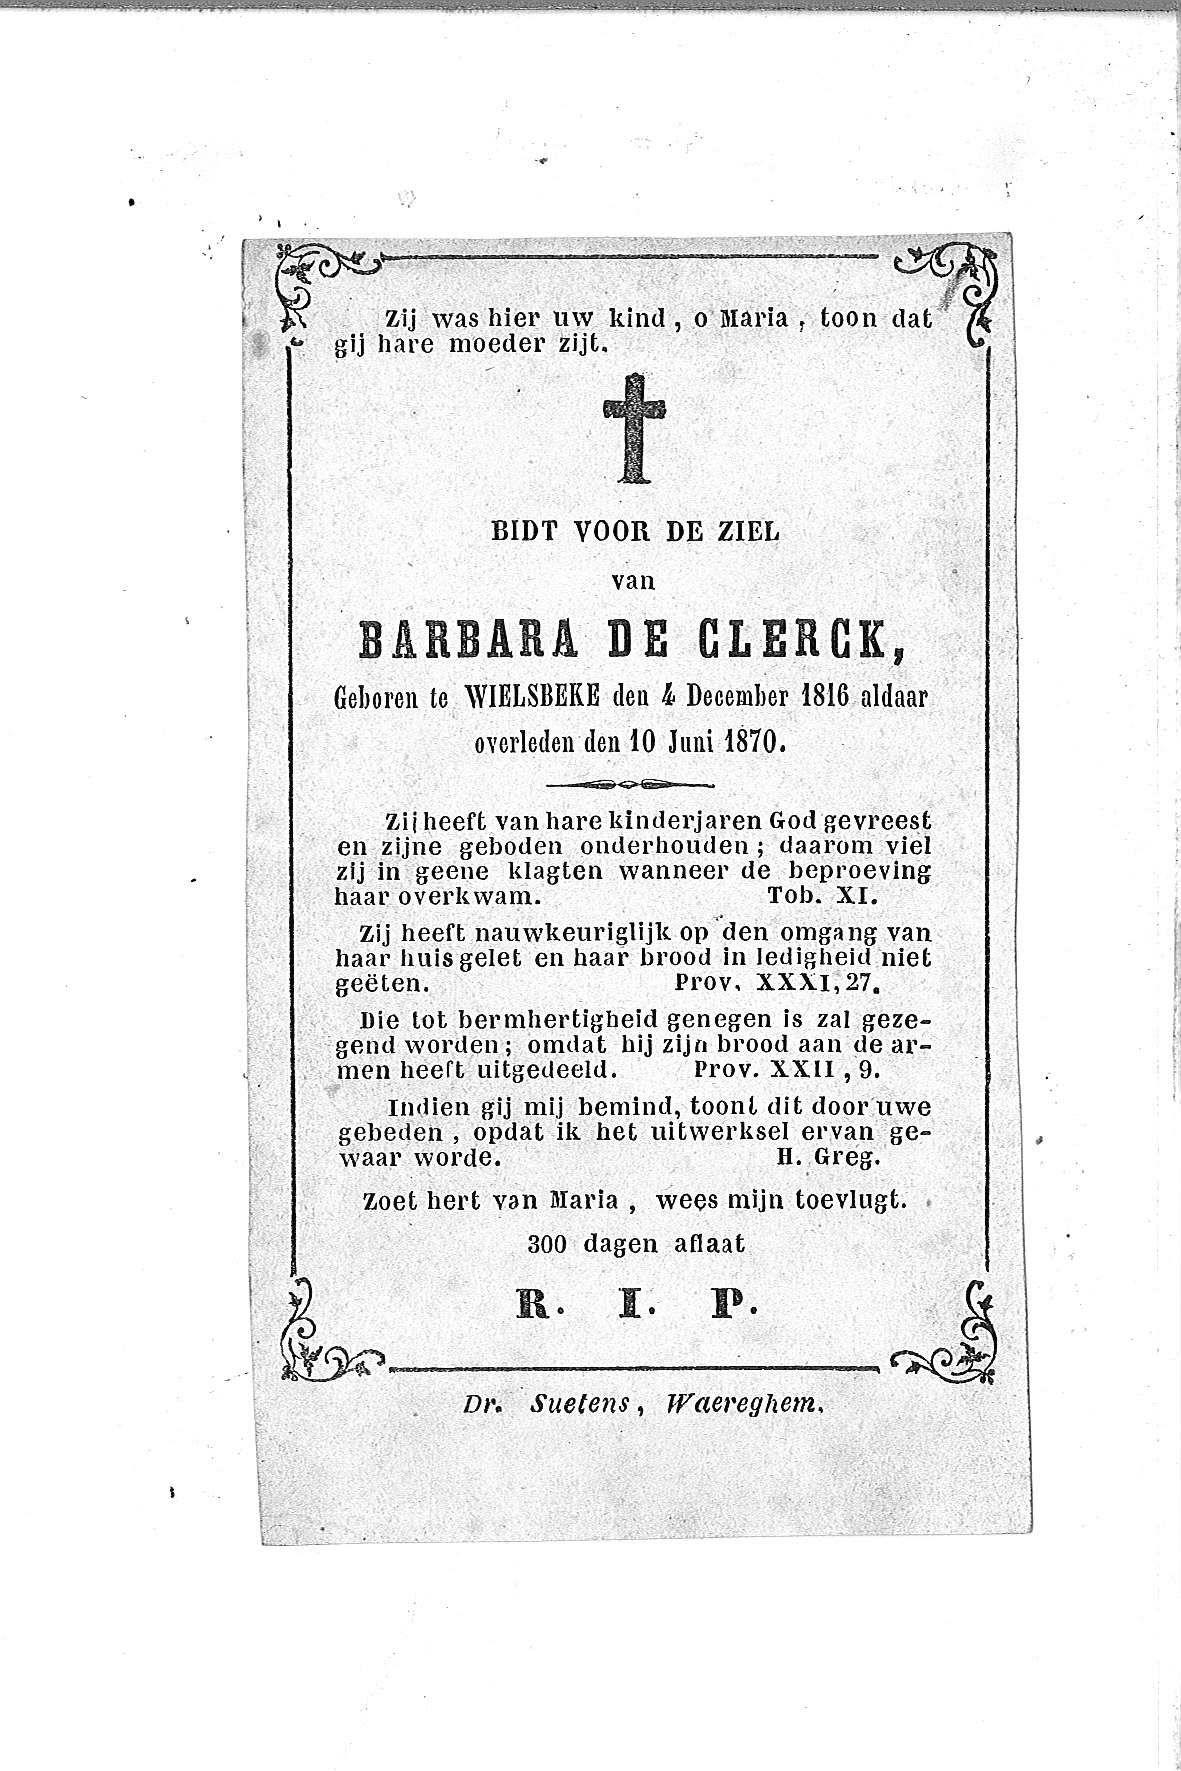 barbara(1870)20120830084338_00055.jpg